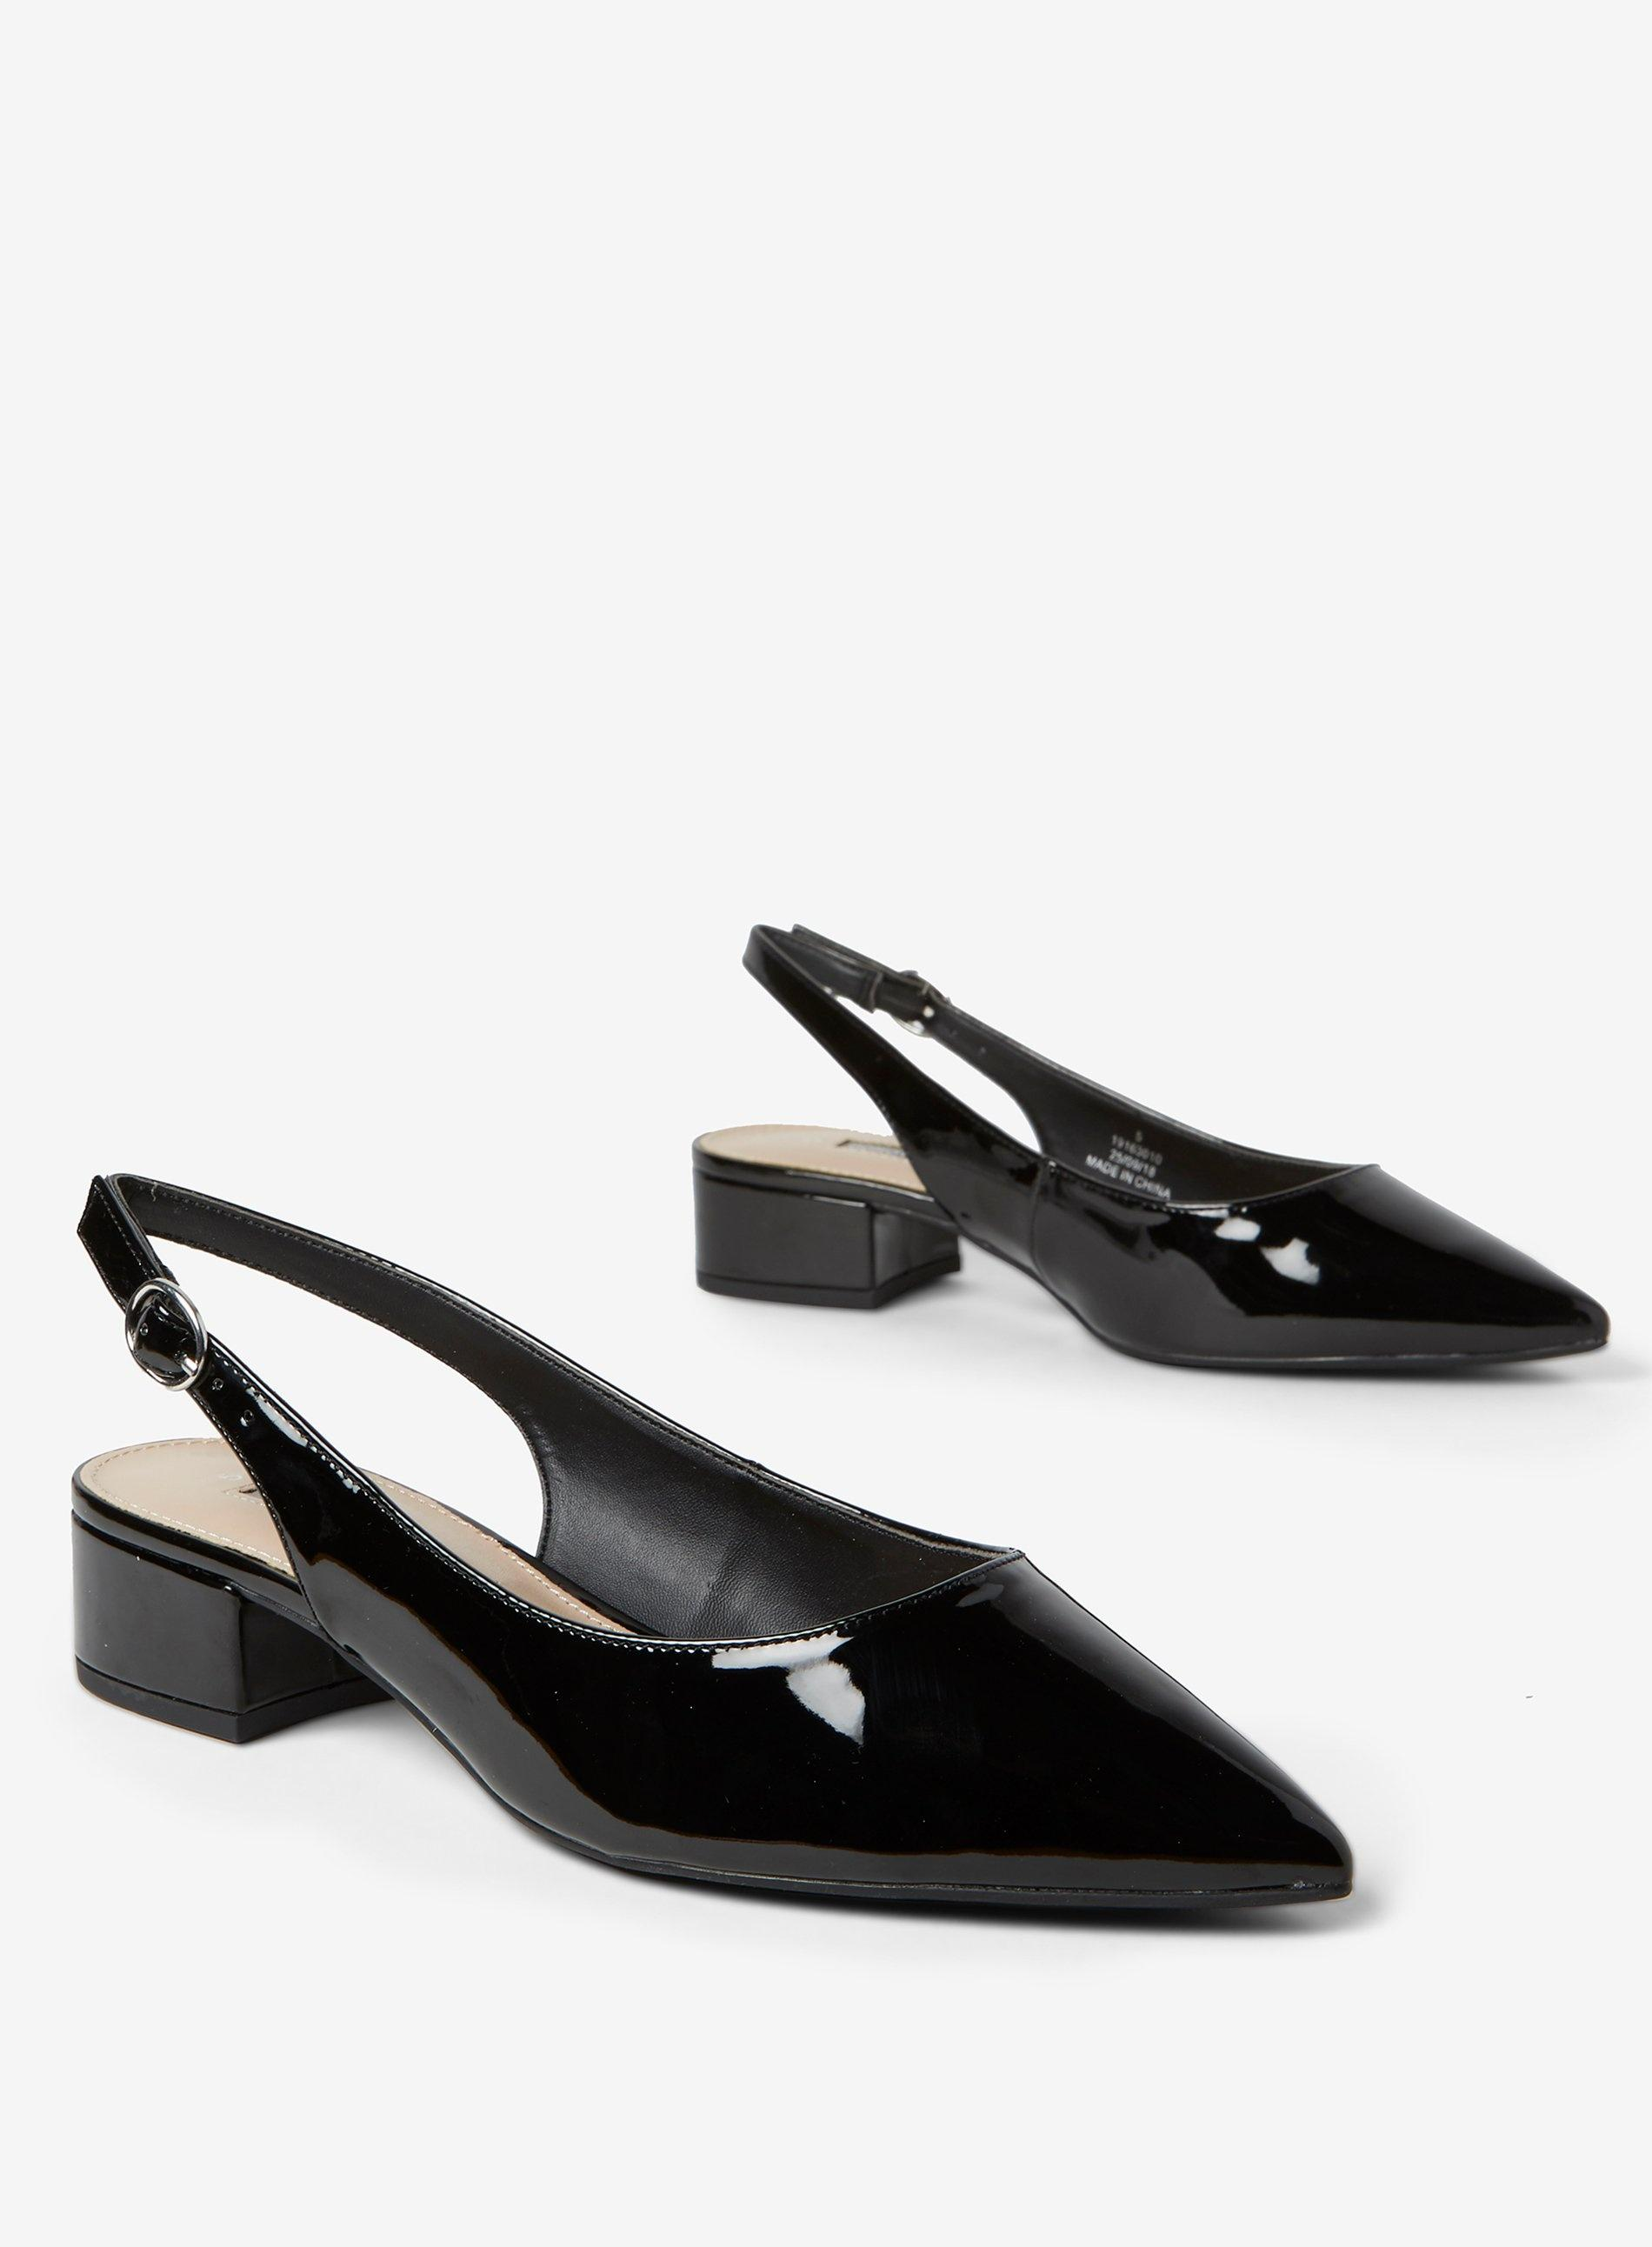 3506ed1946 Dorothy Perkins - Black 'daphne' Block Heel Court Shoes - Lyst. View  fullscreen